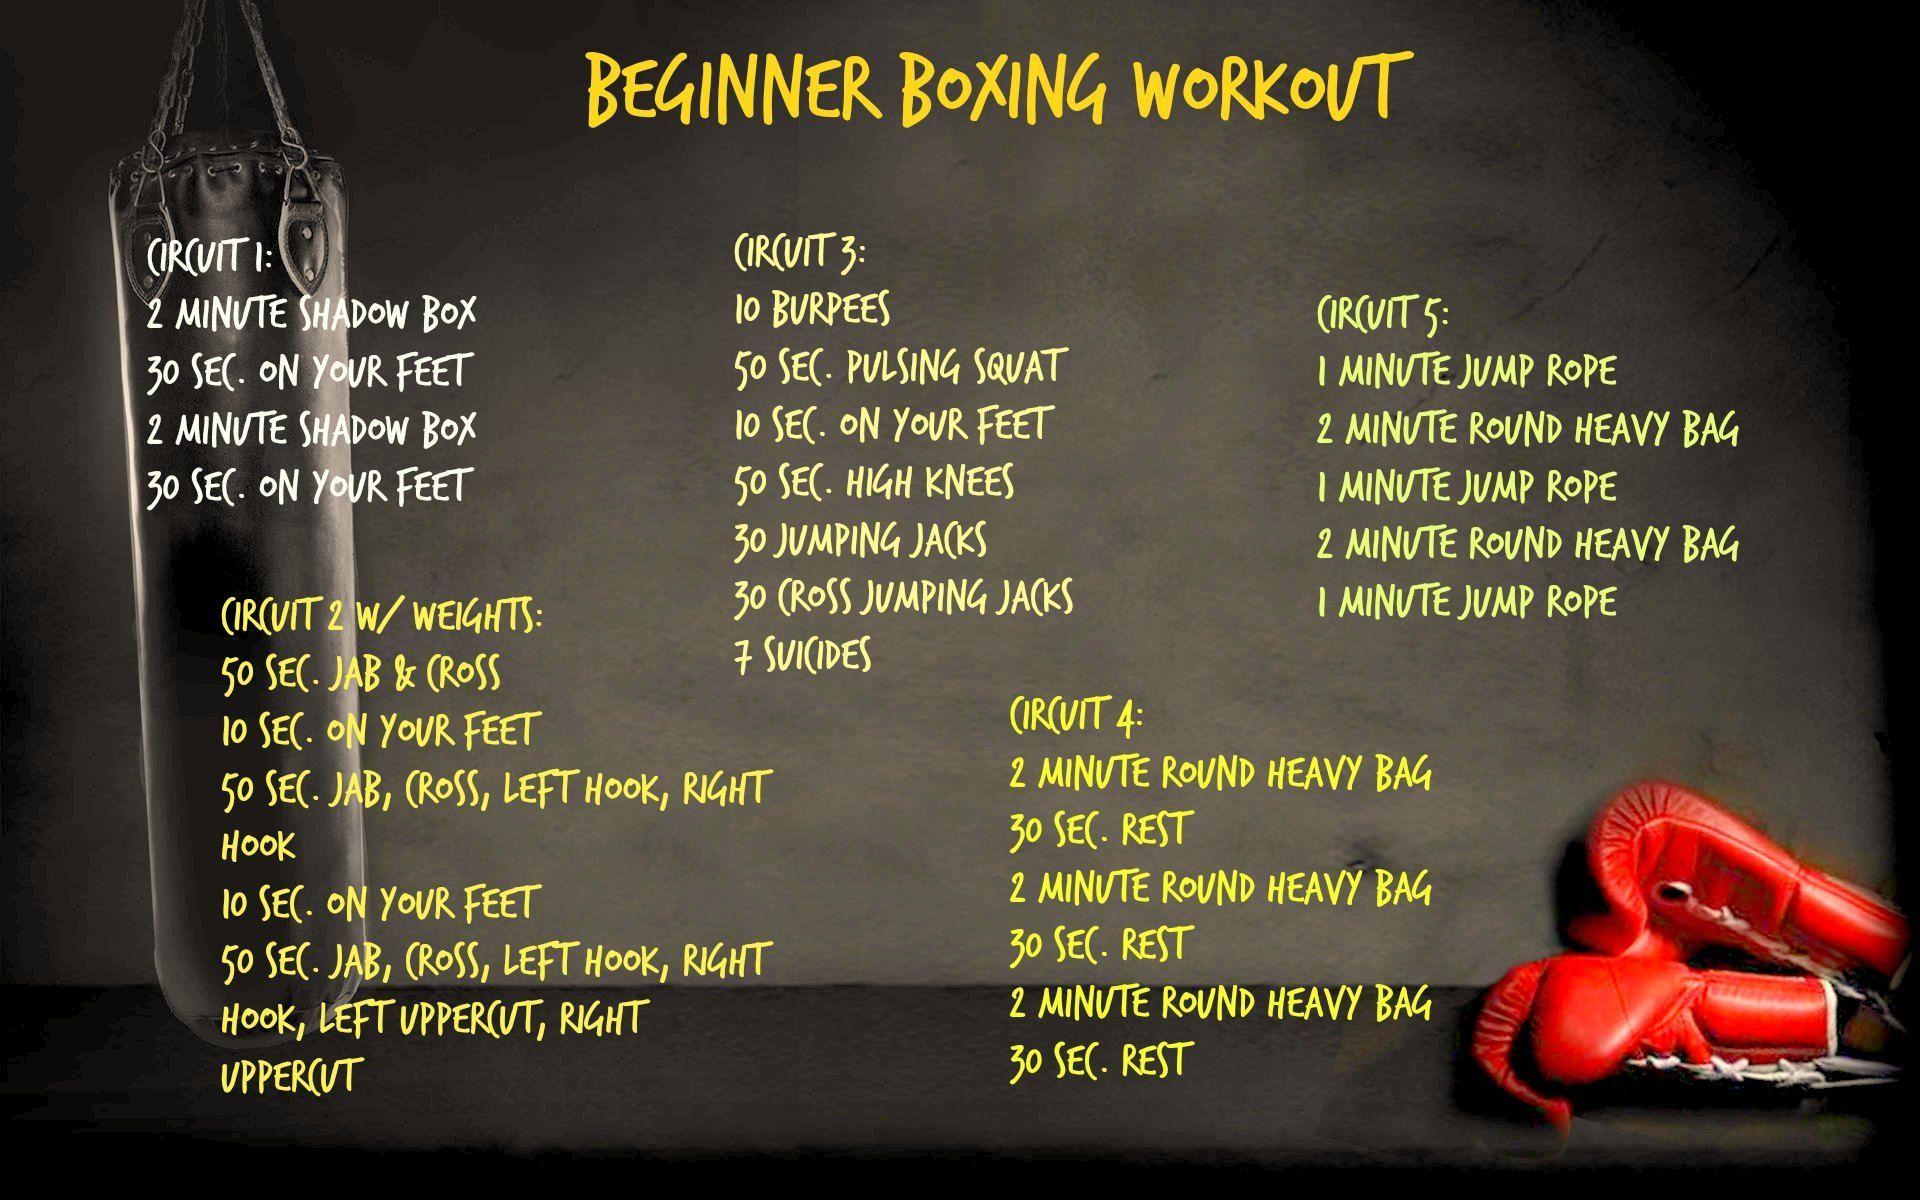 Beginner Boxing Workout